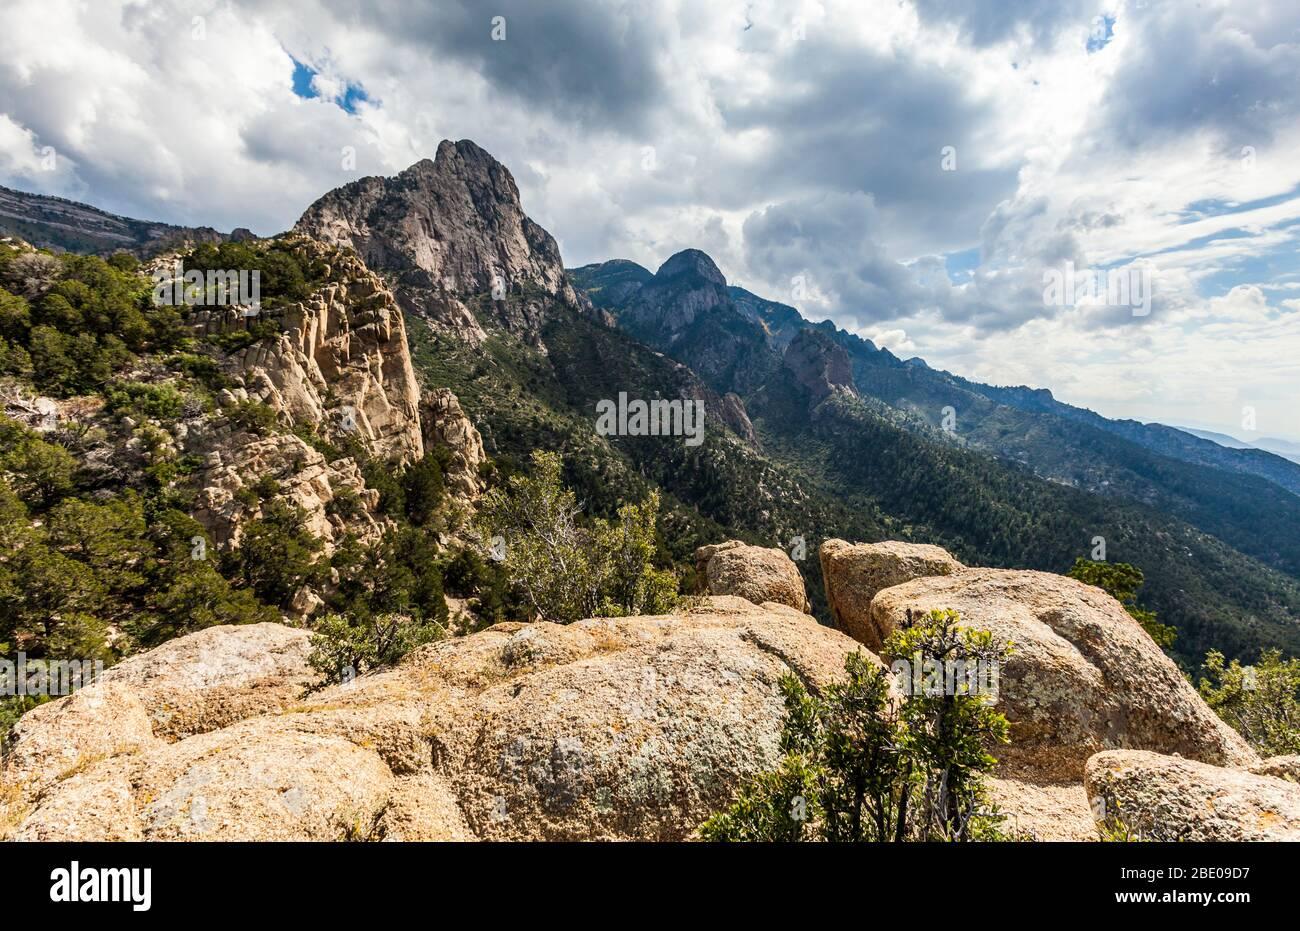 The Sandia Mountains outside Albuquerque, New Mexico, USA. Stock Photo